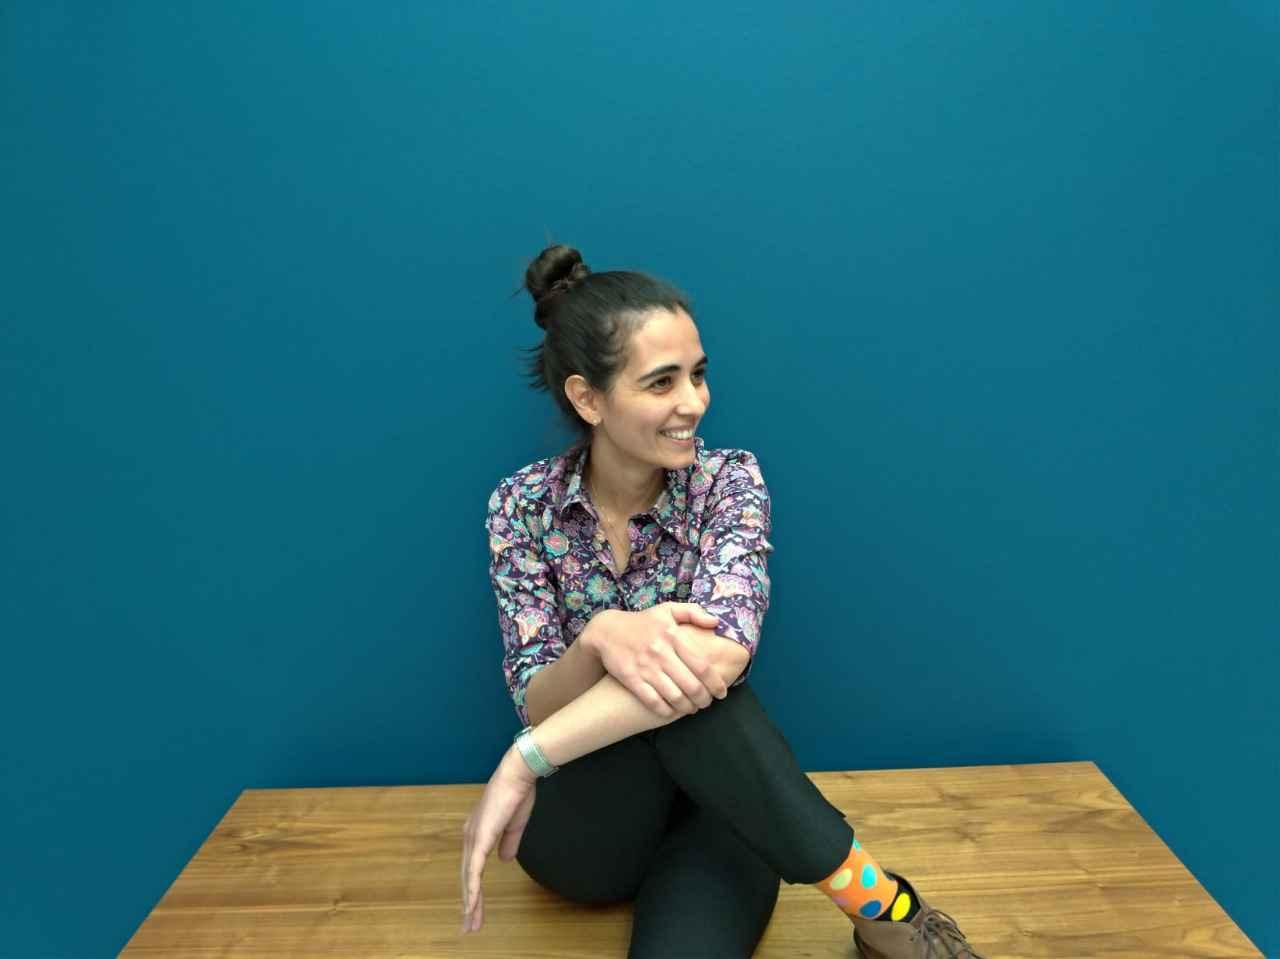 Marina Domingues estudou dispositivos que buscam armazenar e distribuir o hidrogênio